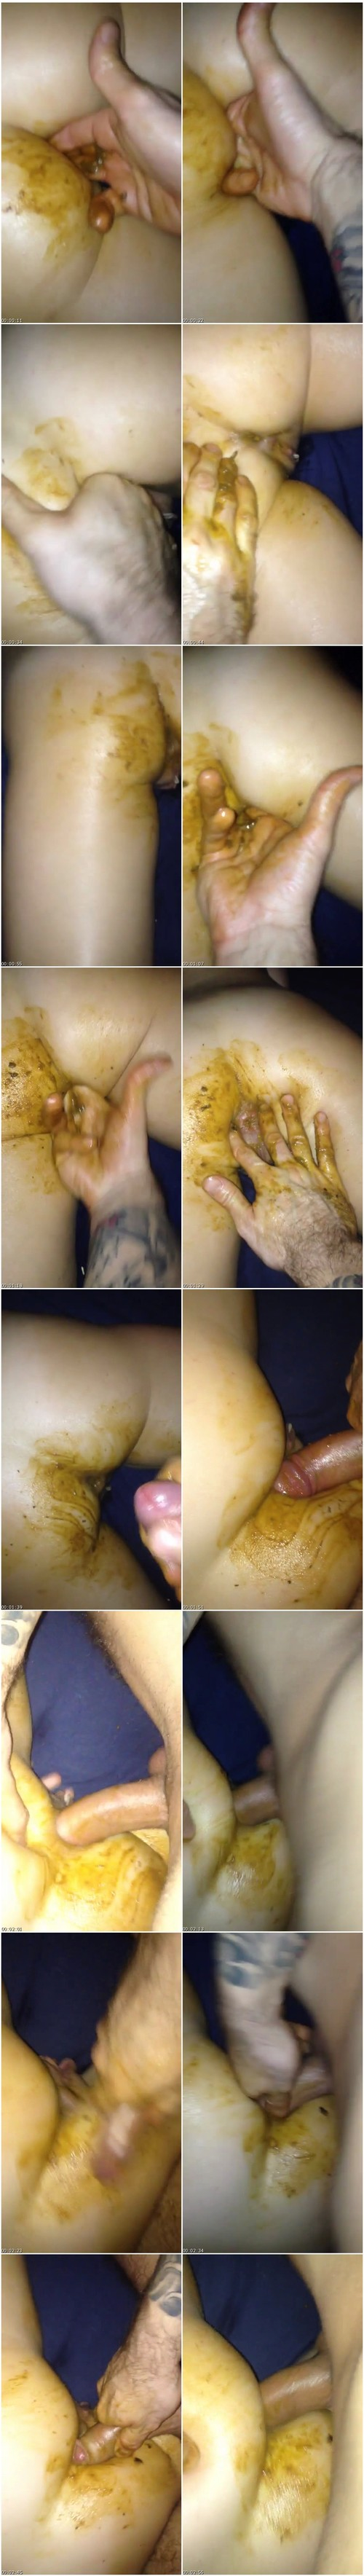 SexwithSHITVZ018_thumb_m.jpg